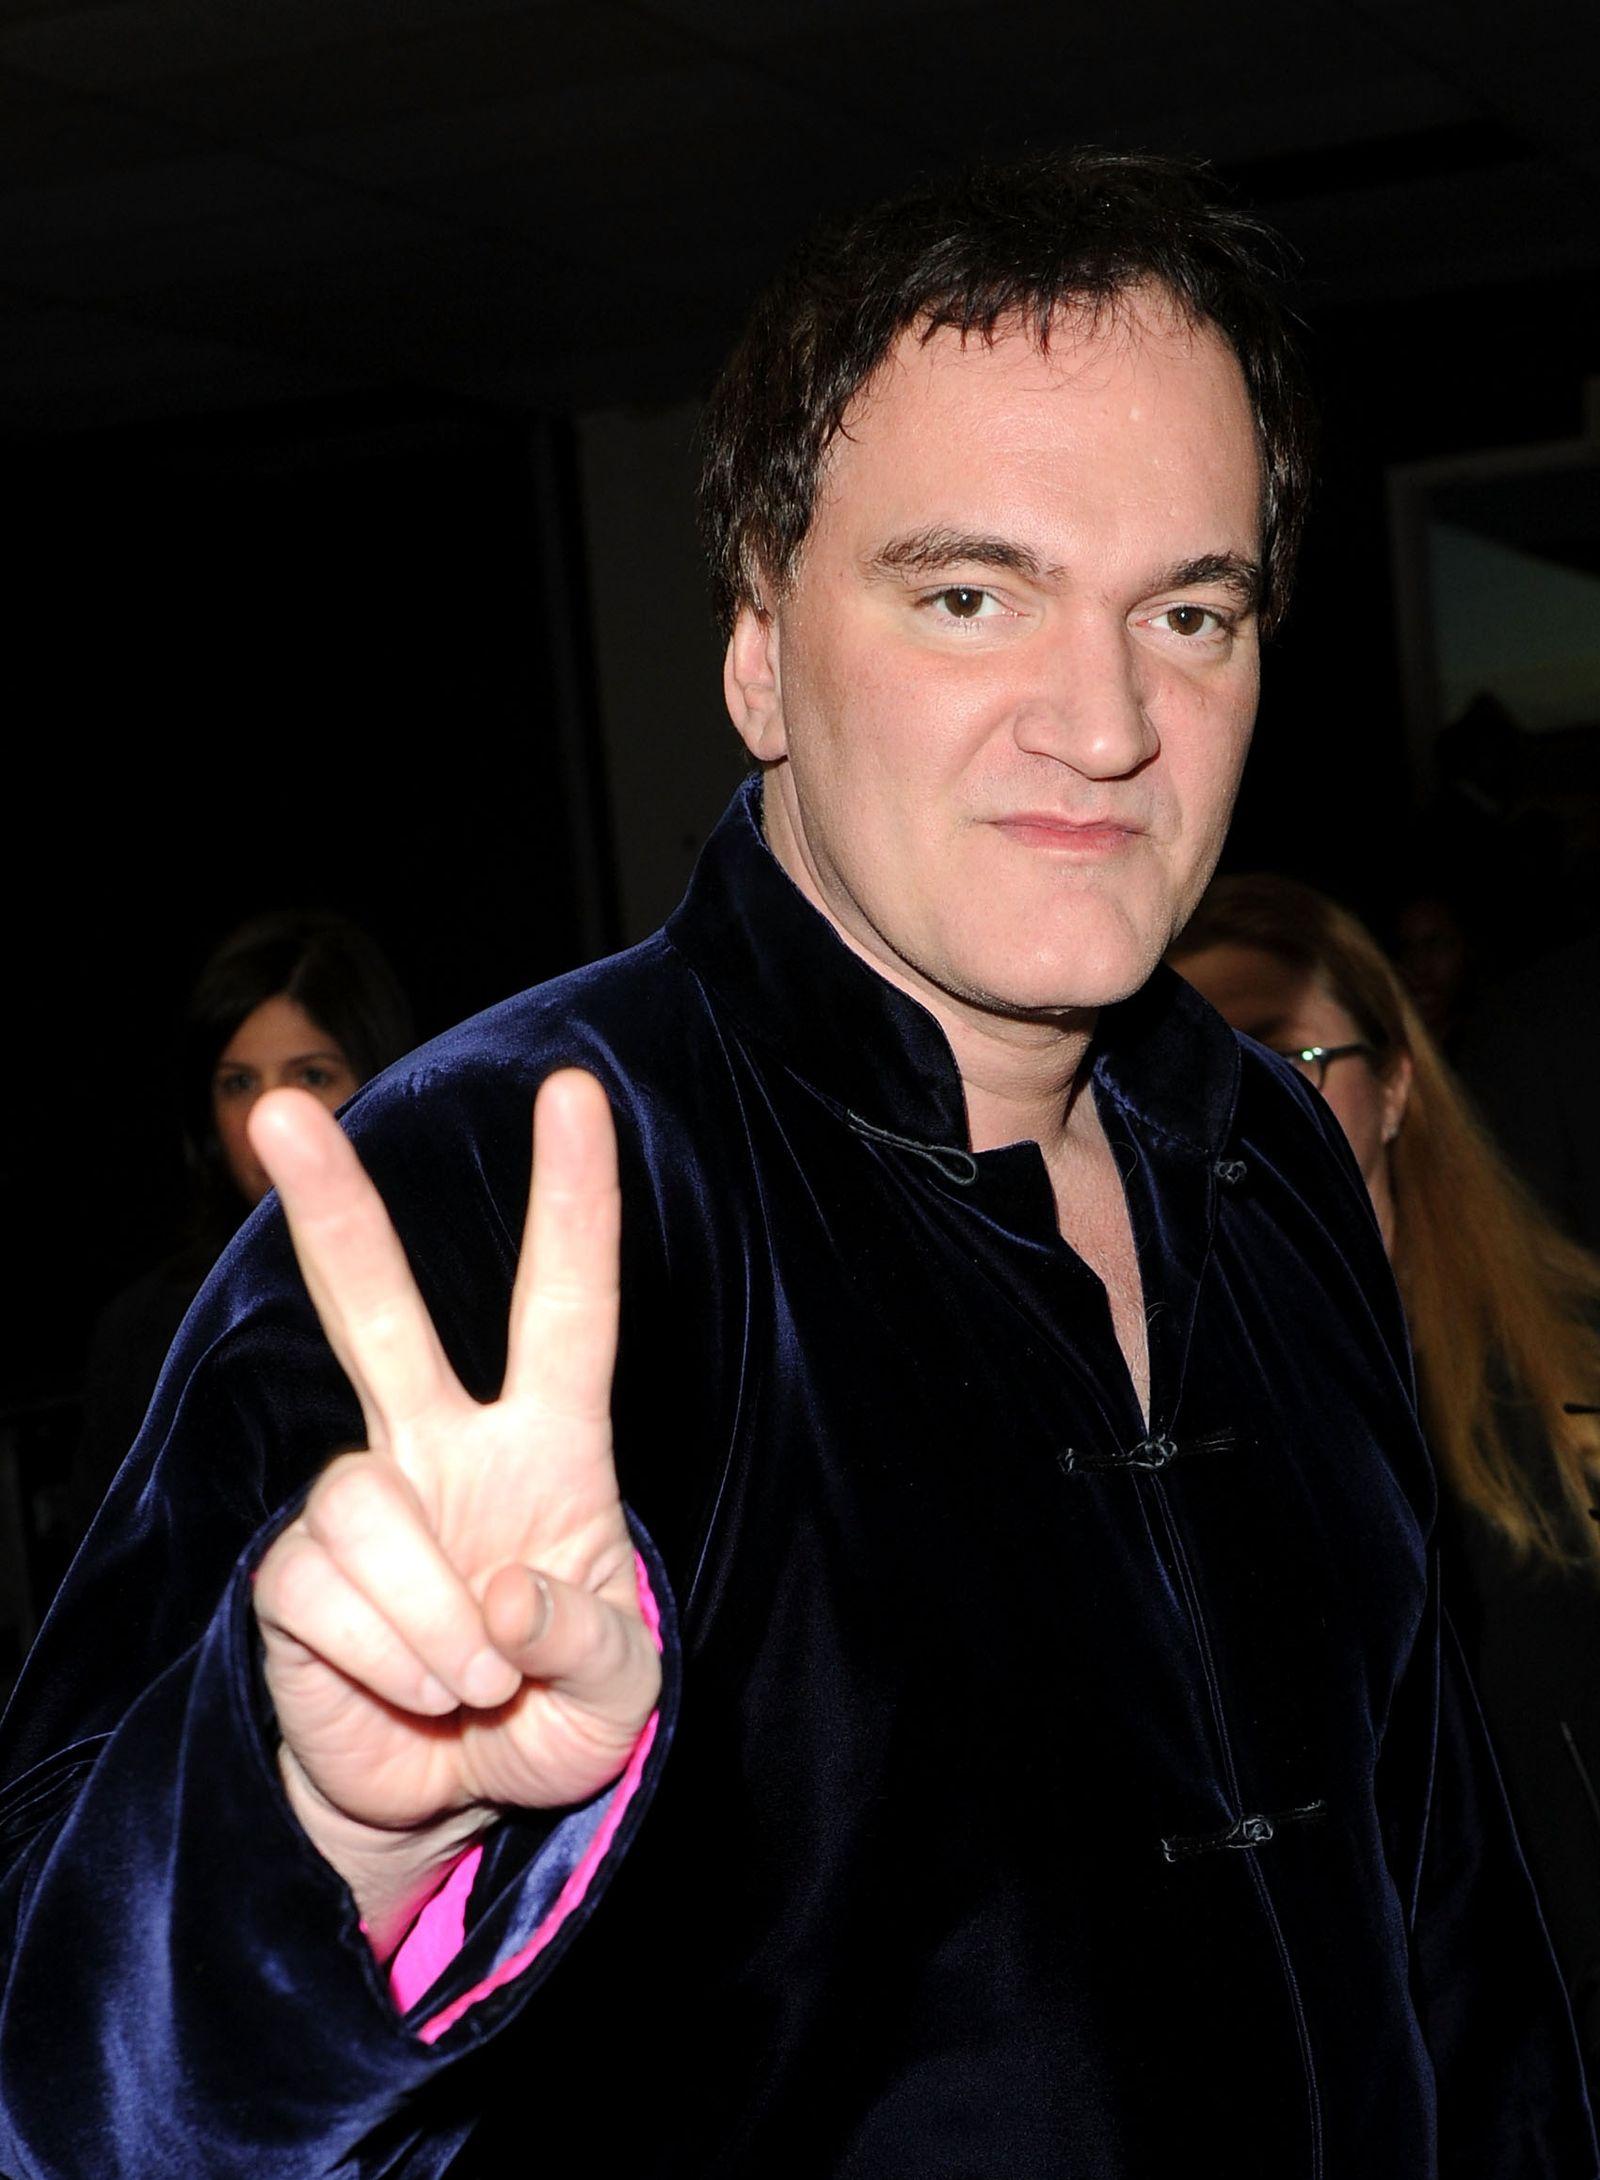 Oscar Freebies / Quentin Tarantino